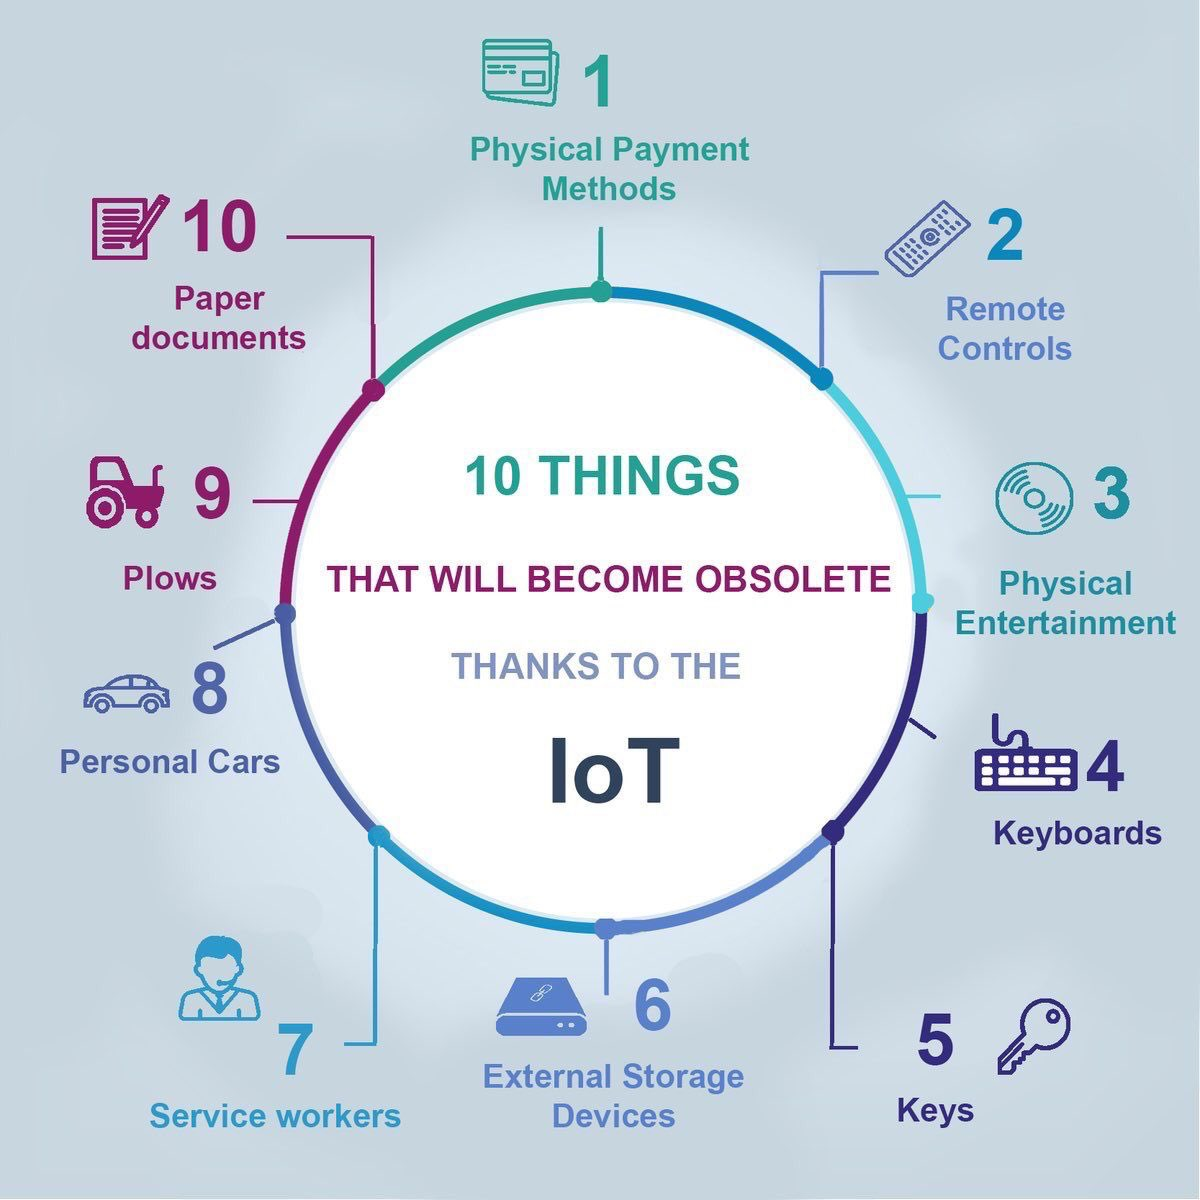 10 Things will become obsolete. Thanks to #IoT  #SocialMedia #MarketingOnTwitter #CyberSecurity #Blockchain #MachineLearning #Fintech #SEO #BigData #AI #CX  #SMM #ContentMarketing #BigData #Defstar5 #Makeyourownlane #GrowthHacking #UX #UI #Webdev #WebDevelopment<br>http://pic.twitter.com/FEFbNBdjpJ